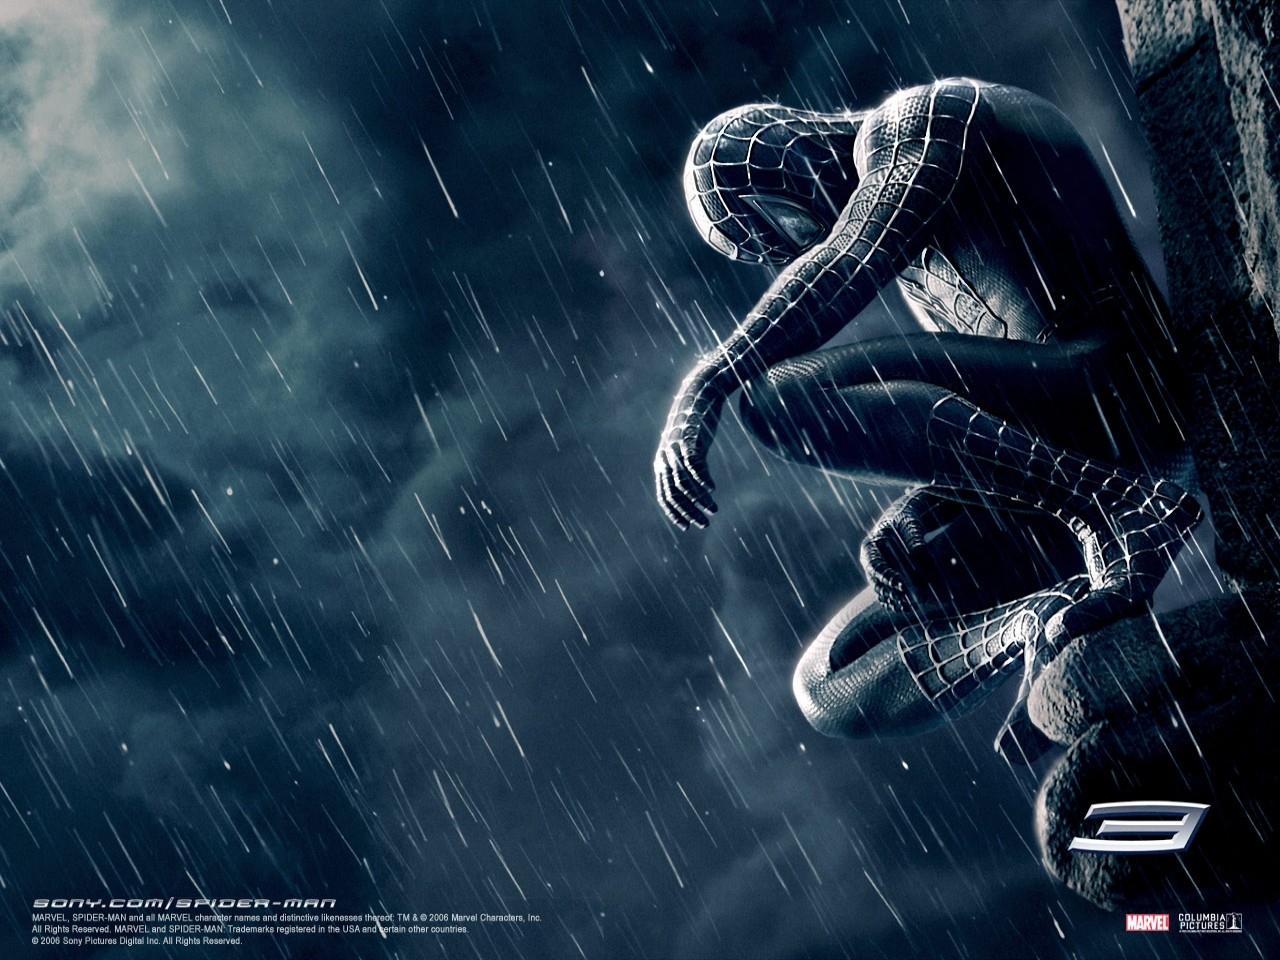 Desktop Wallpaper del film Spider-Man 3